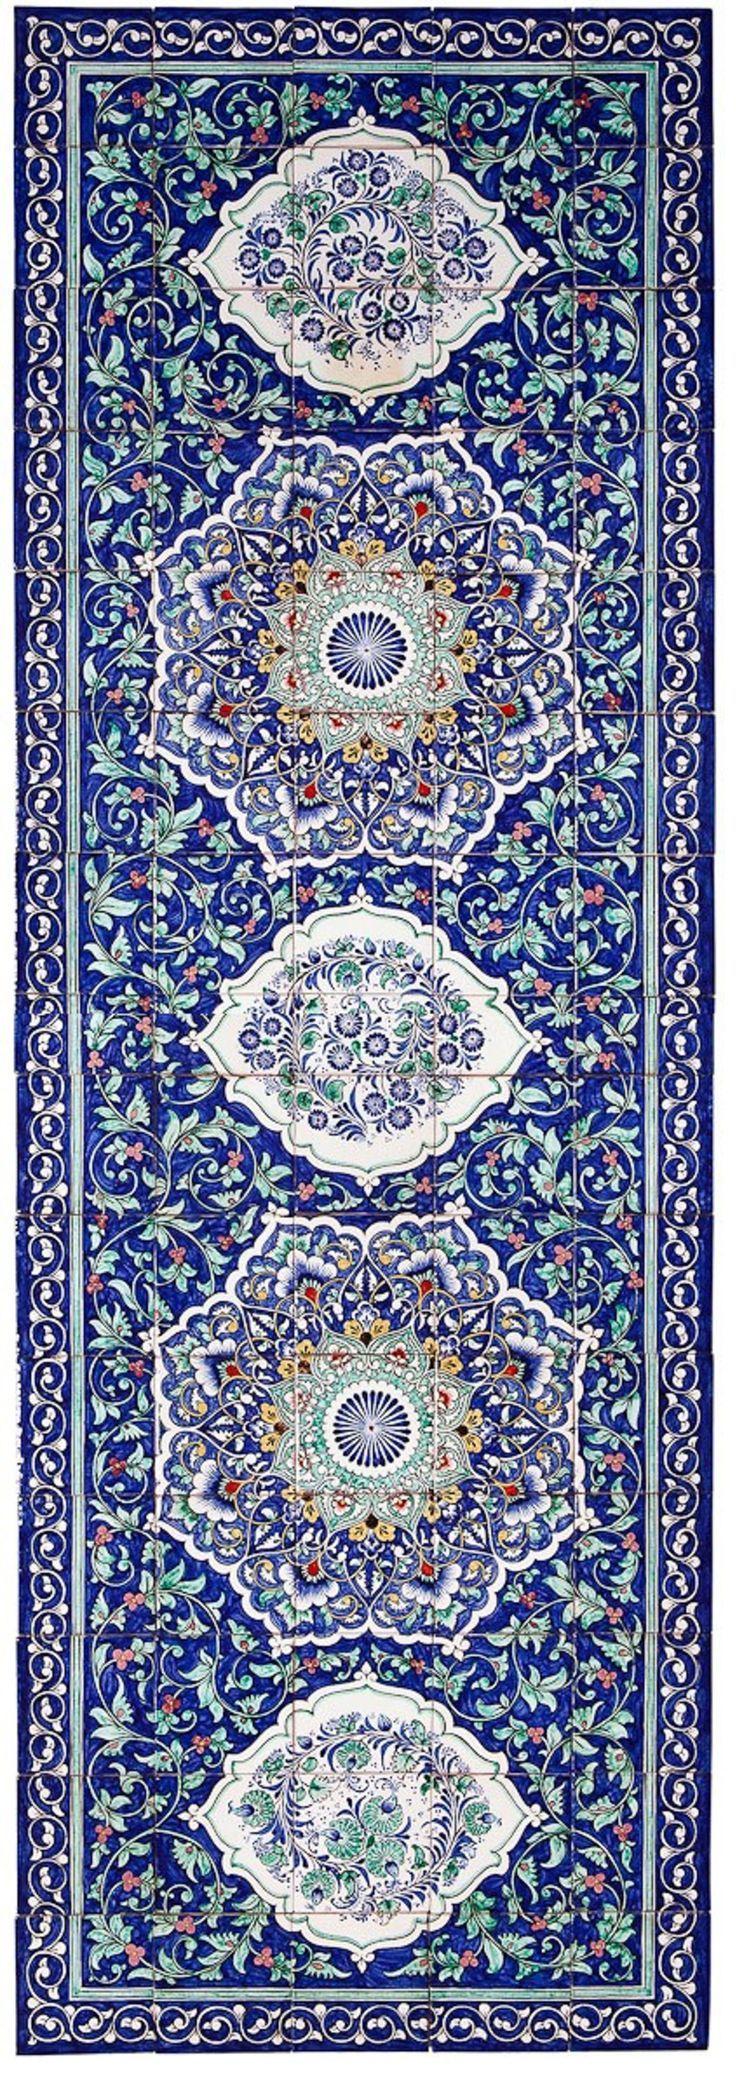 Details about hassam garden painting ceramic bathroom tile murals 2 - 5bda75e417e9e5e2992107c38b833646 Jpg 736 2083